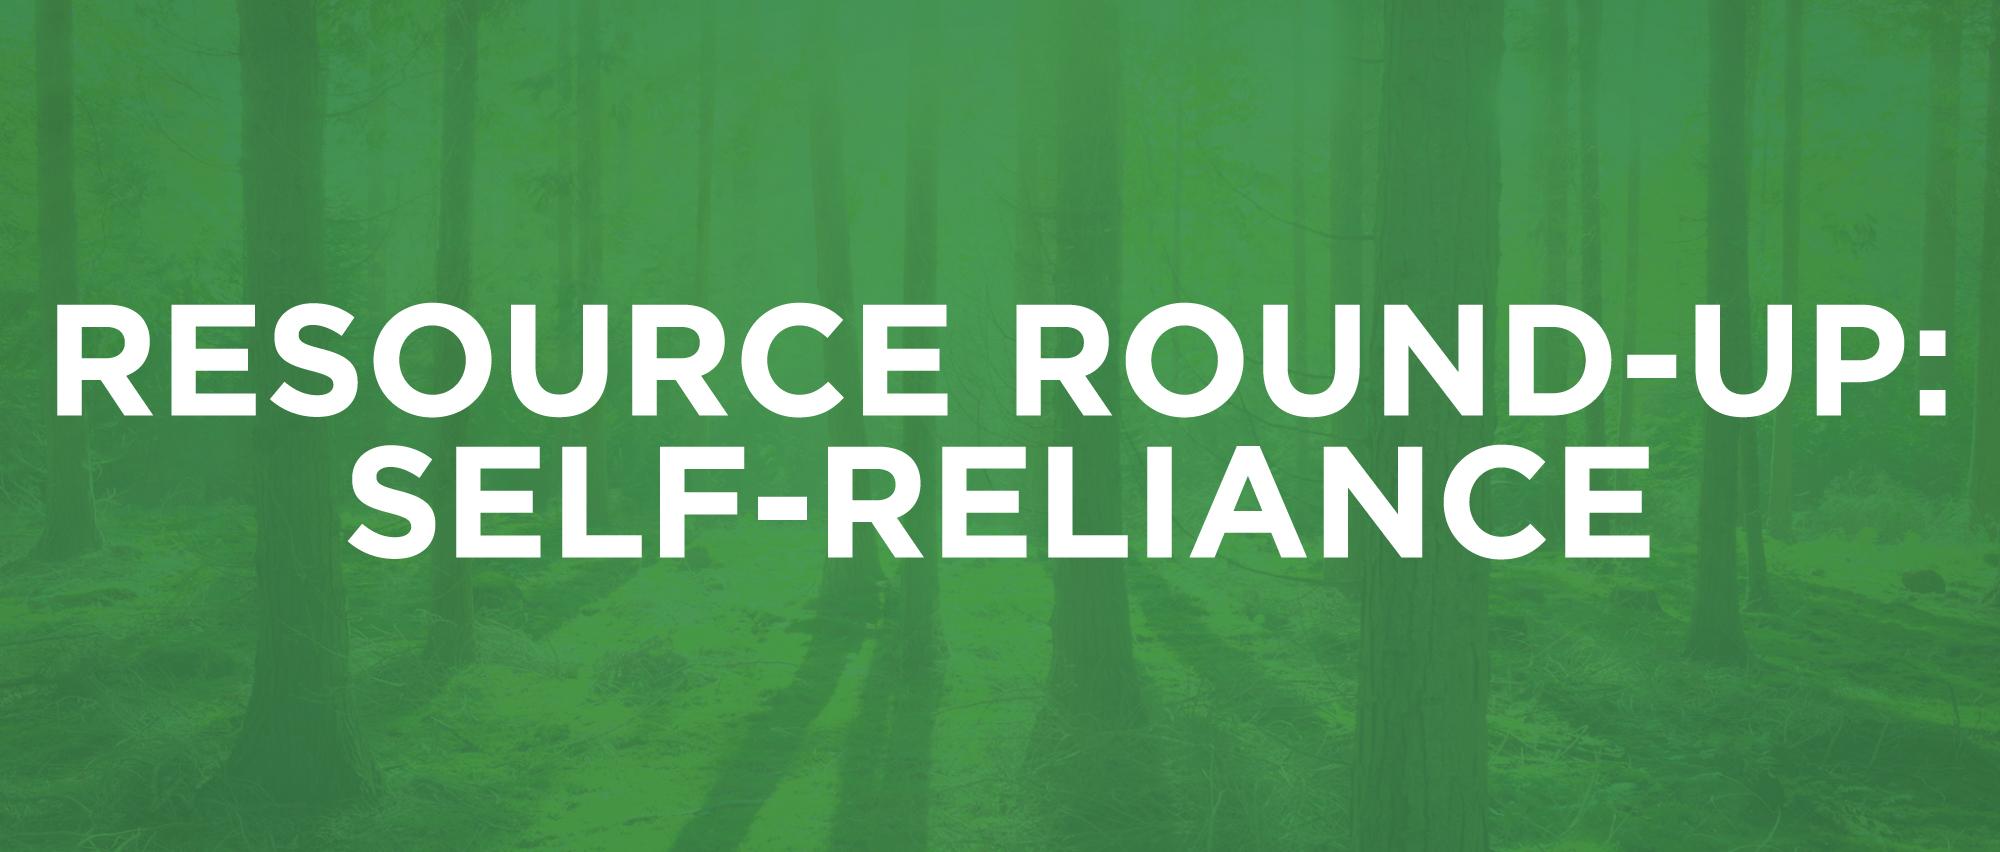 ResourceRoundup-3-SelfReliance.jpg